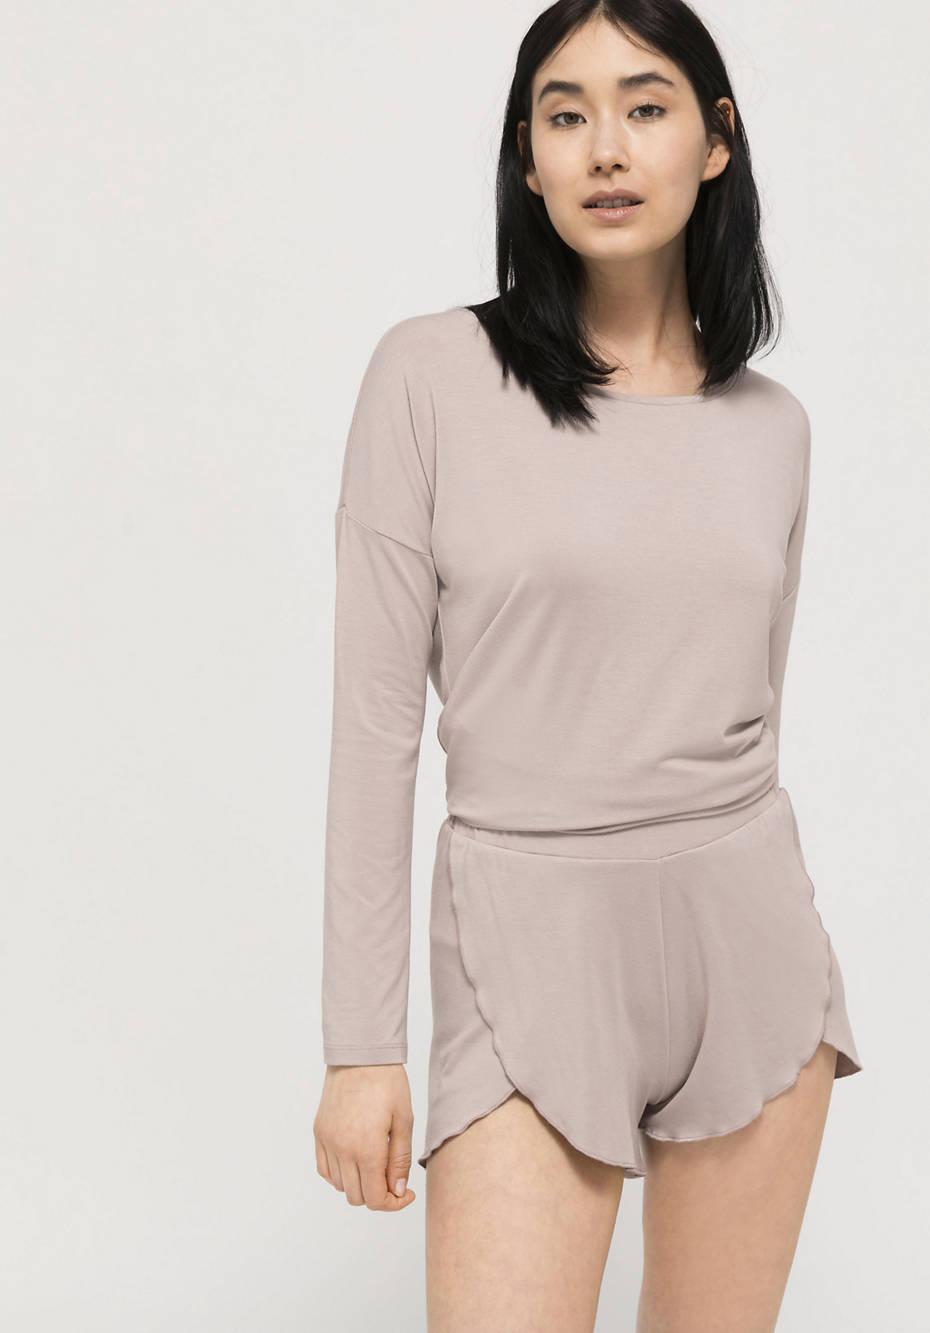 Long-sleeved sleep shirt made of TENCEL ™ Modal